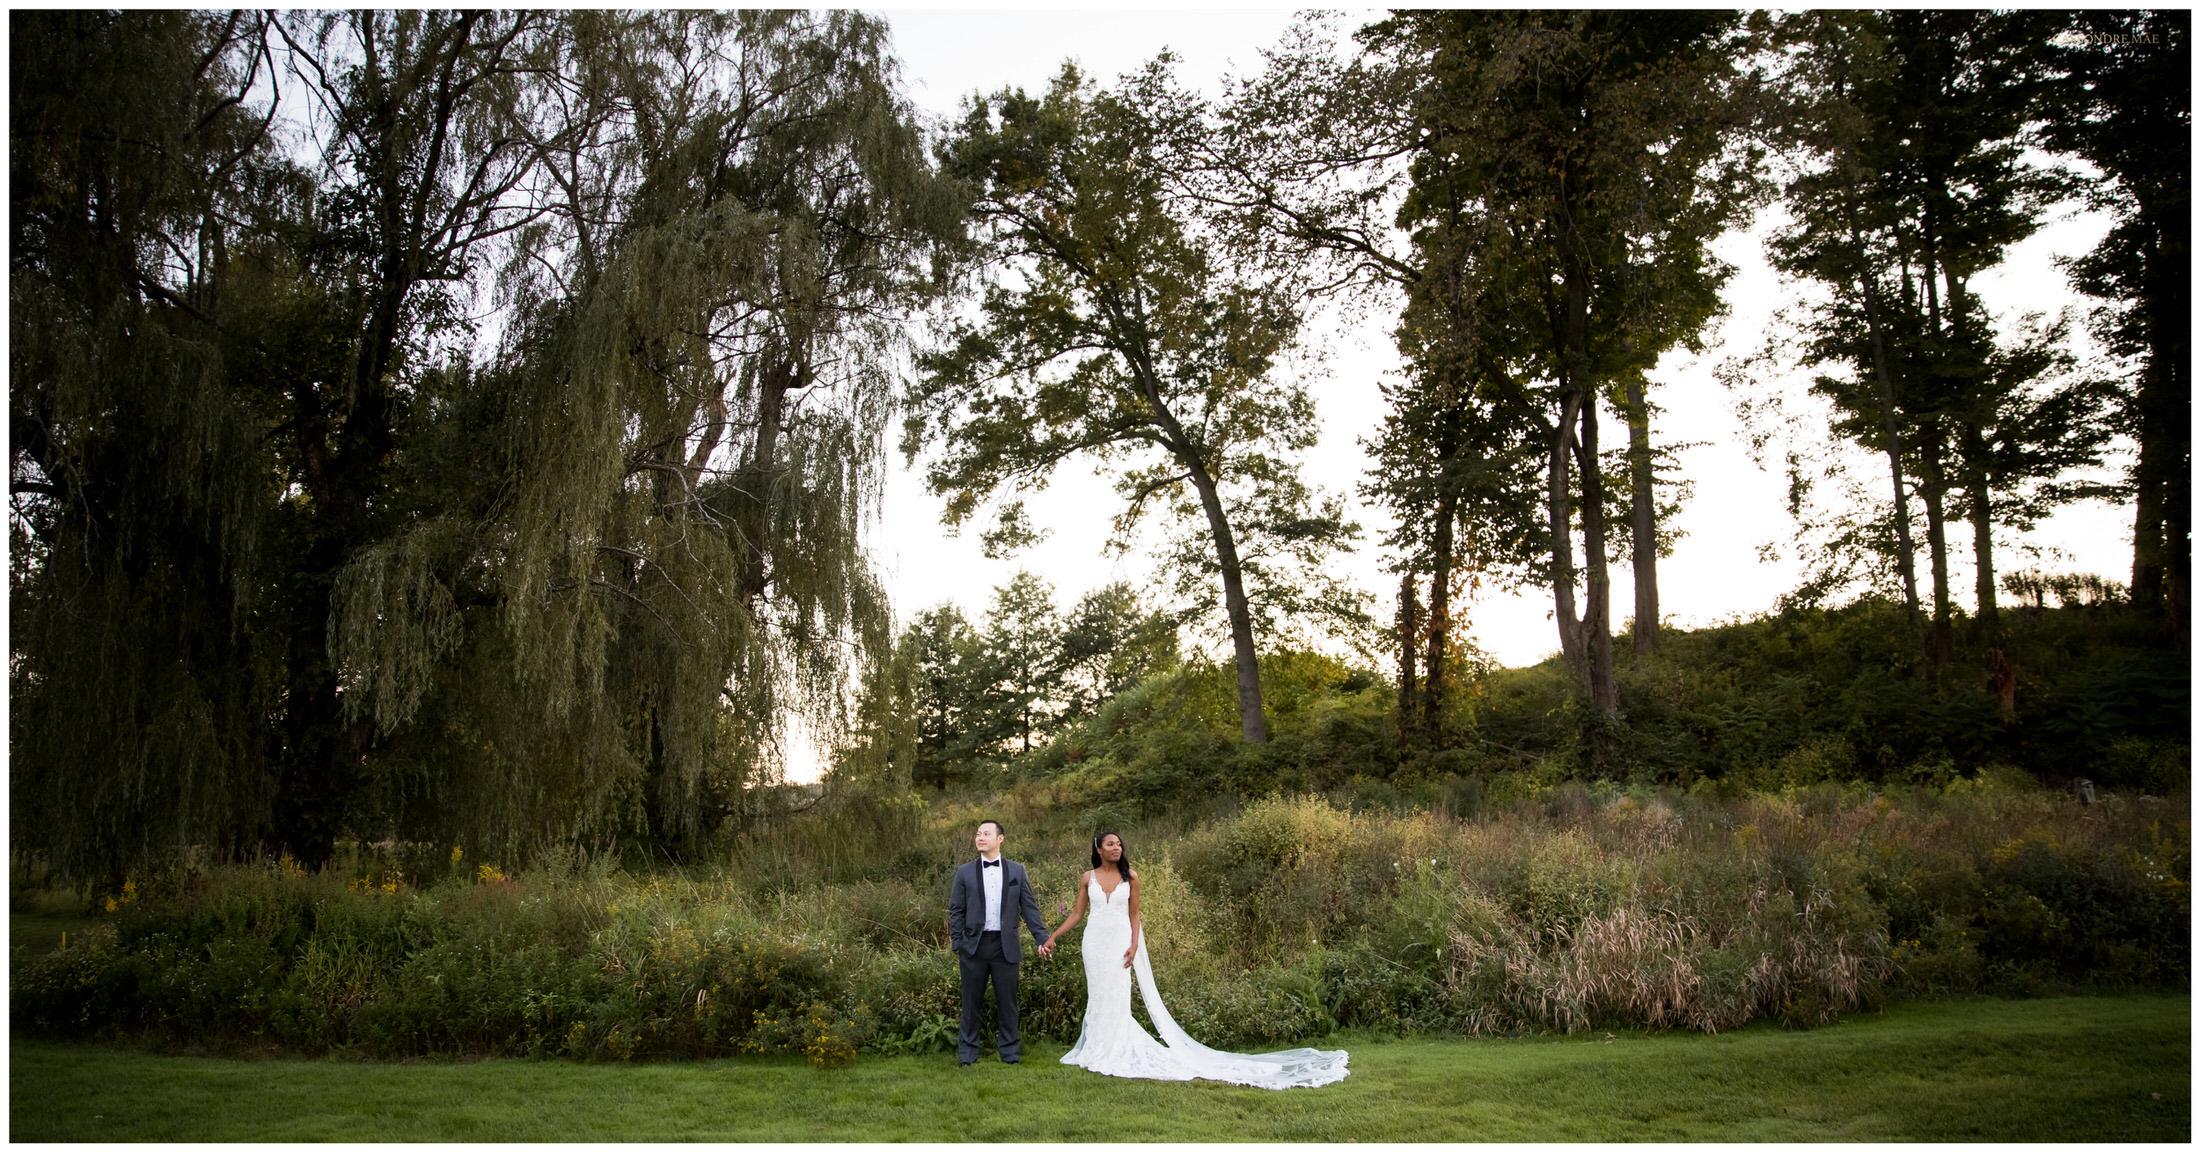 West Hills Country Club Wedding Photos Cassondre Mae Photography 18.jpg